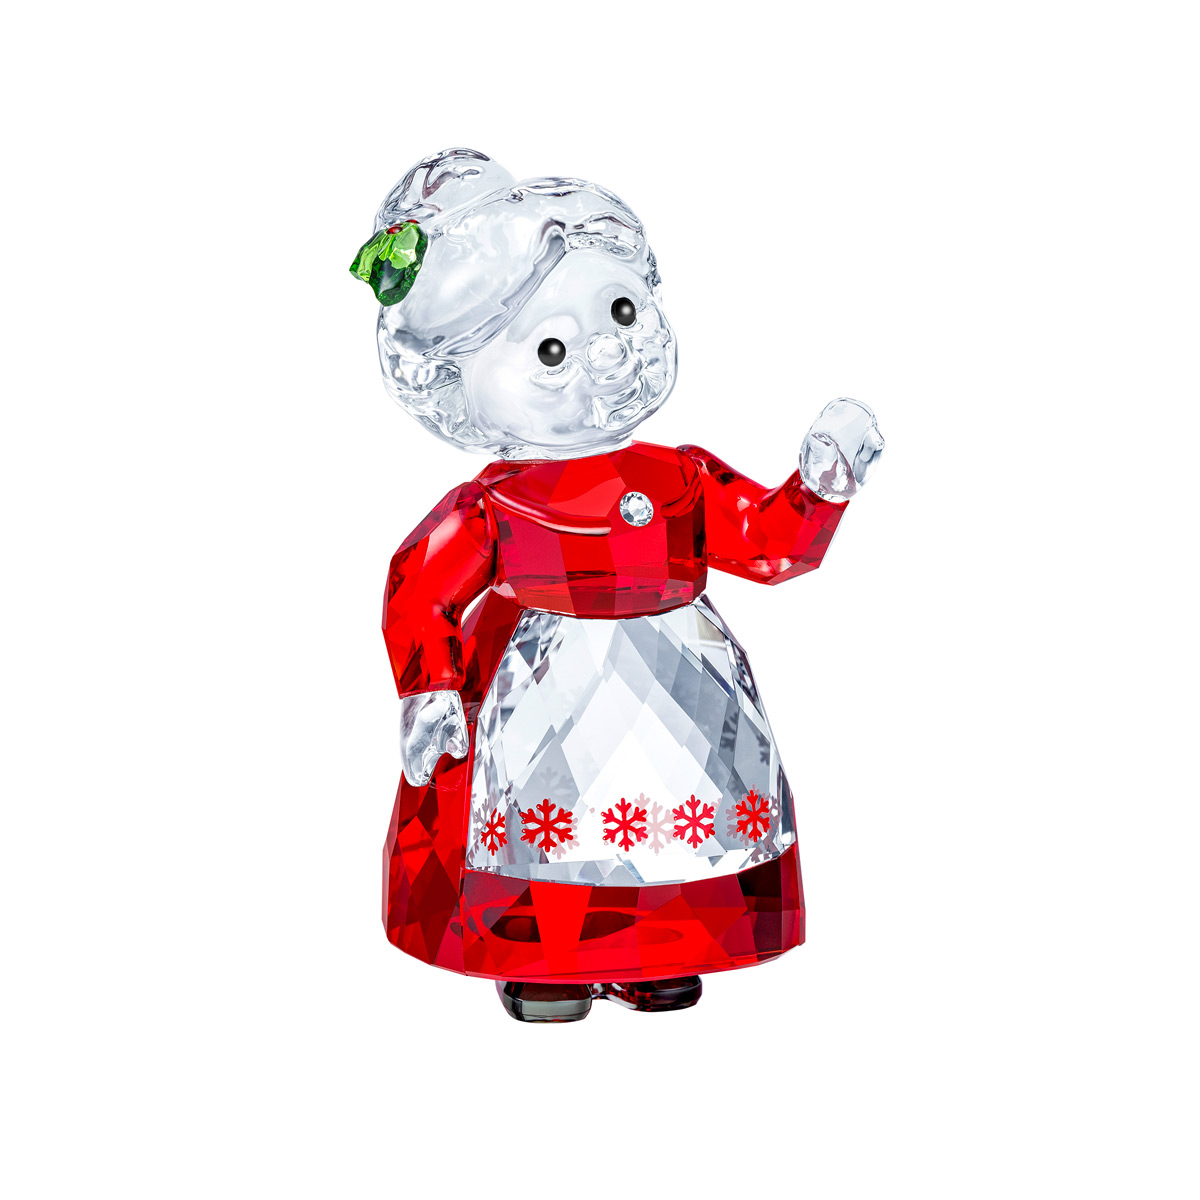 Swarovski Joyful Figurines Mrs. Claus